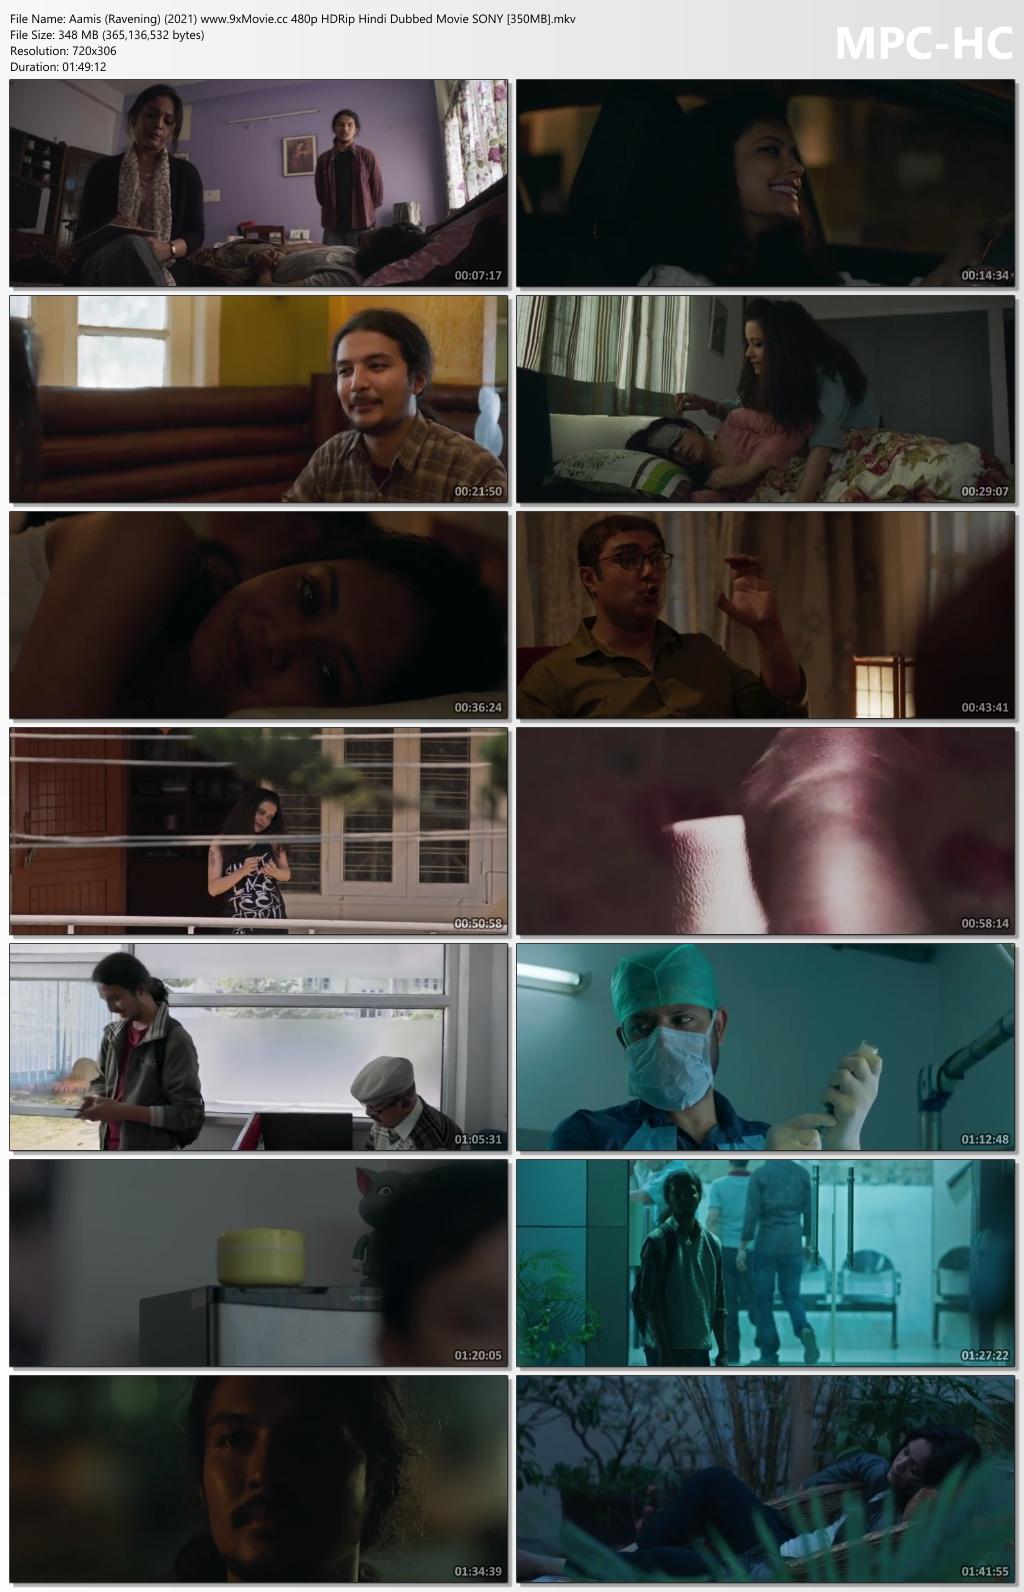 Aamis-Ravening-2021-www-9x-Movie-cc-480p-HDRip-Hindi-Dubbed-Movie-SONY-350-MB-mkv